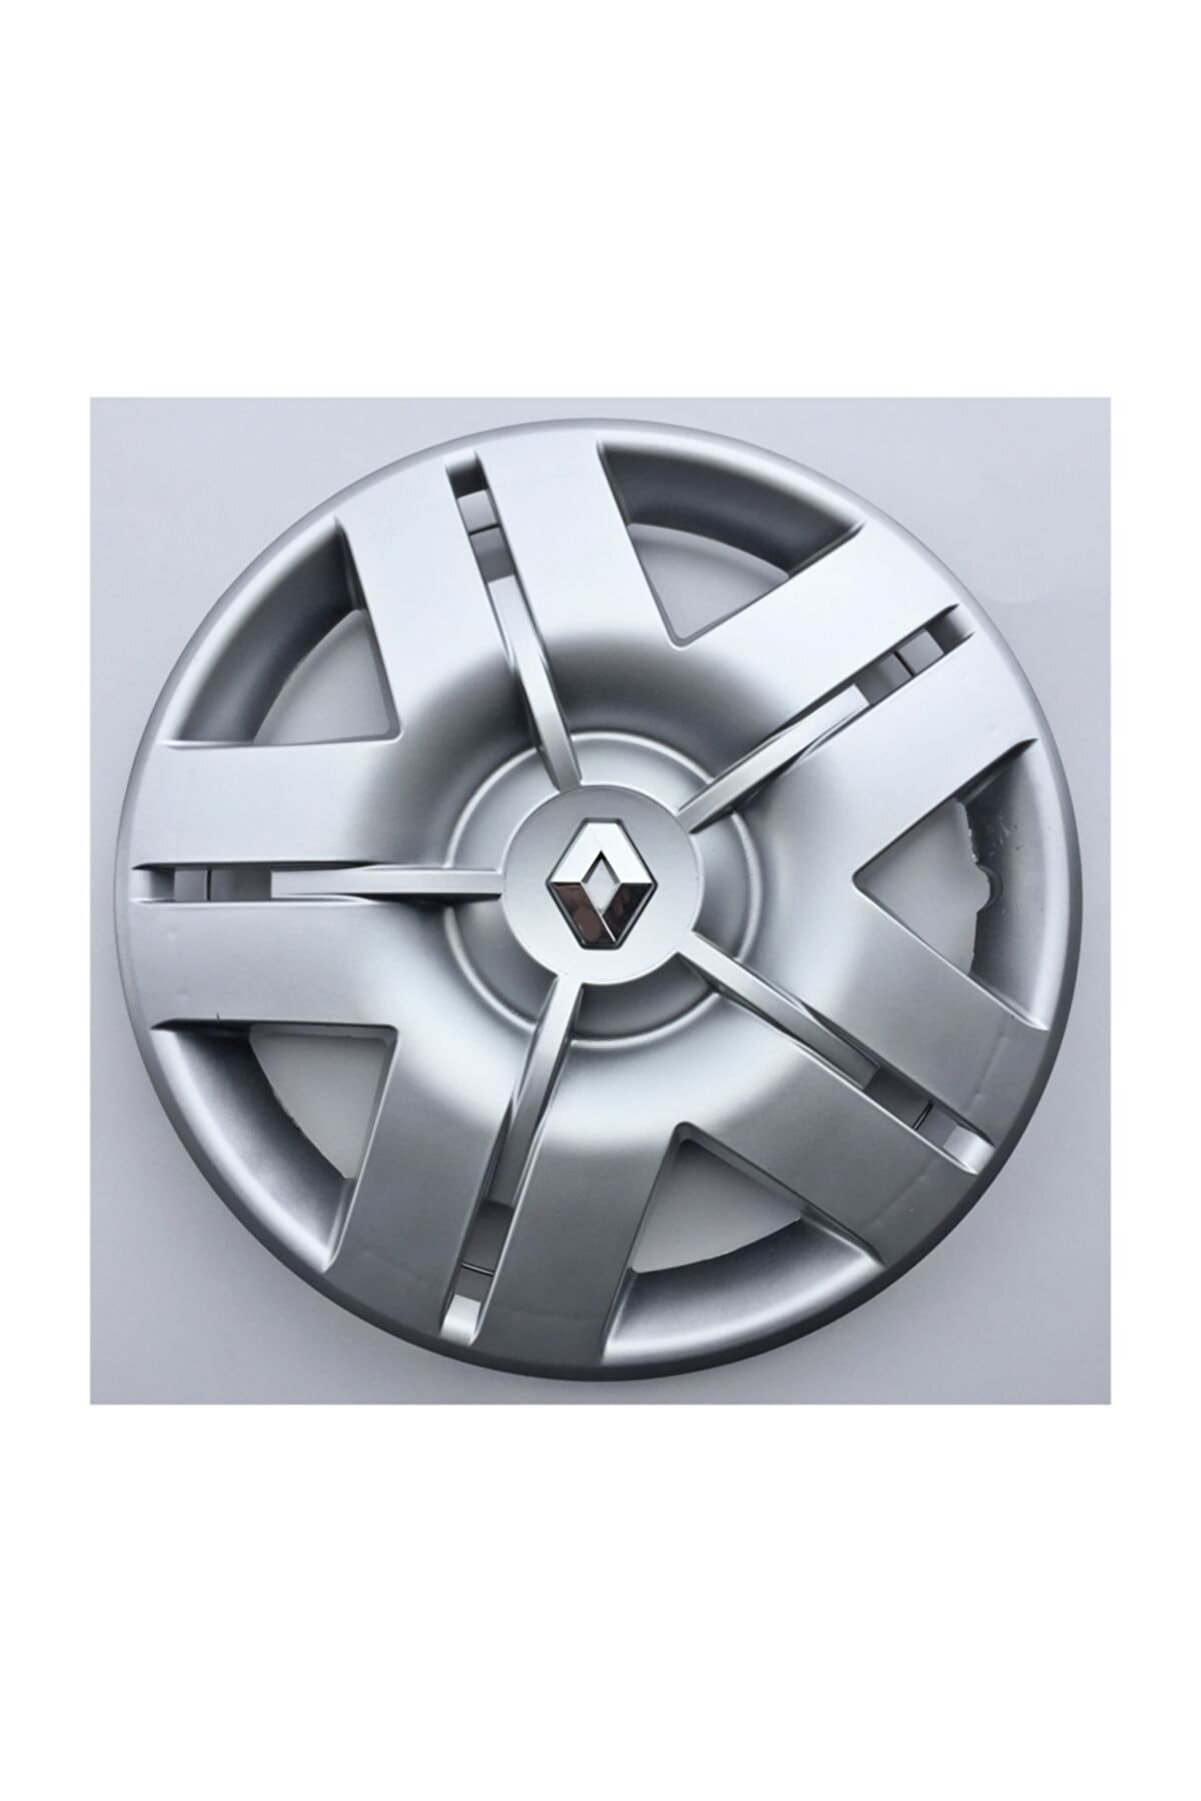 Seta Renault Uyumlu 13'' Inç Jant Kapağı 4 Adet Kırılmaz Esnek - Amblem Hediyeli